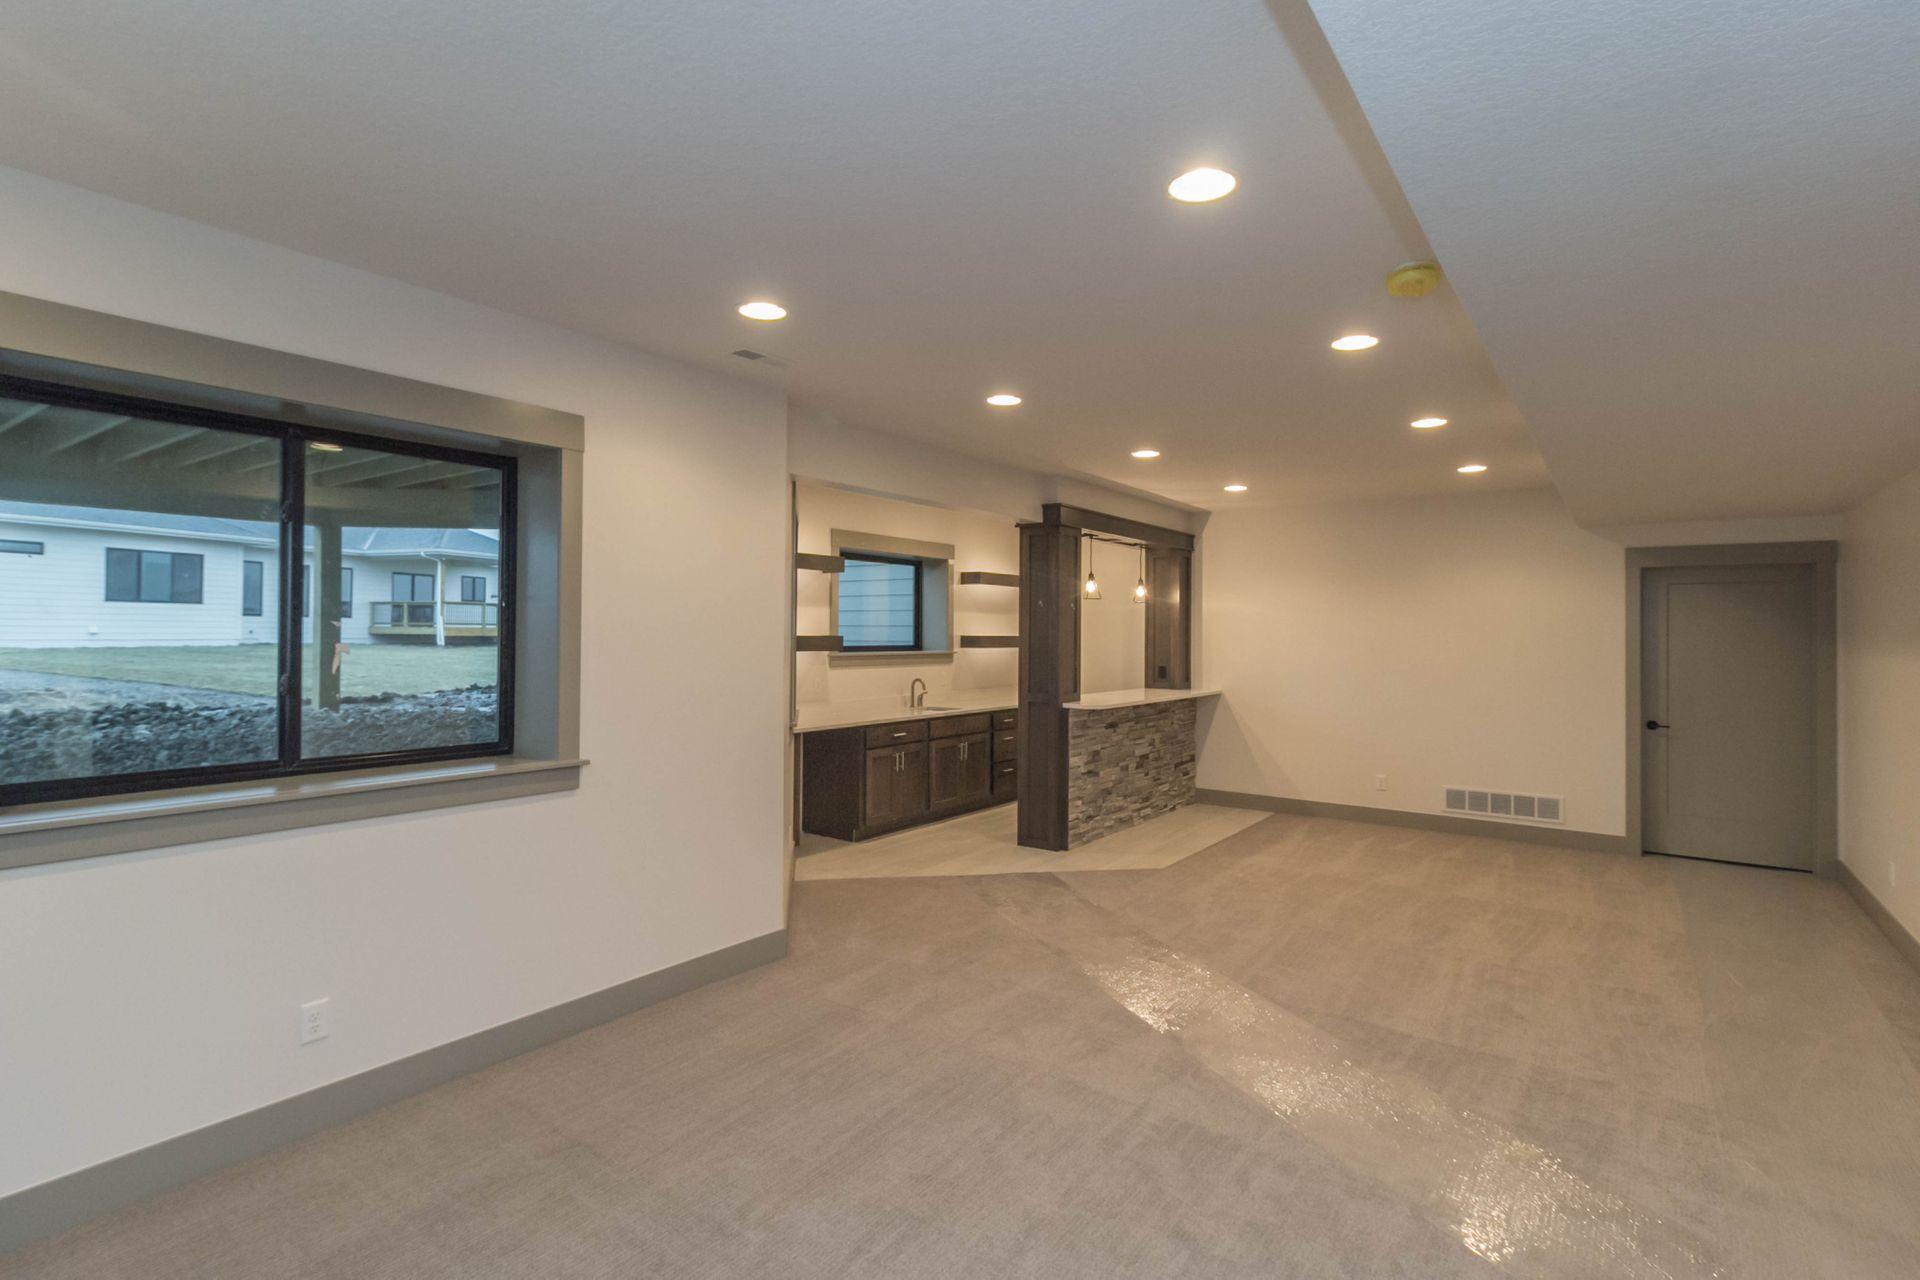 Next-Step-Homes_16885-madison-cir-clive-IA23.jpg